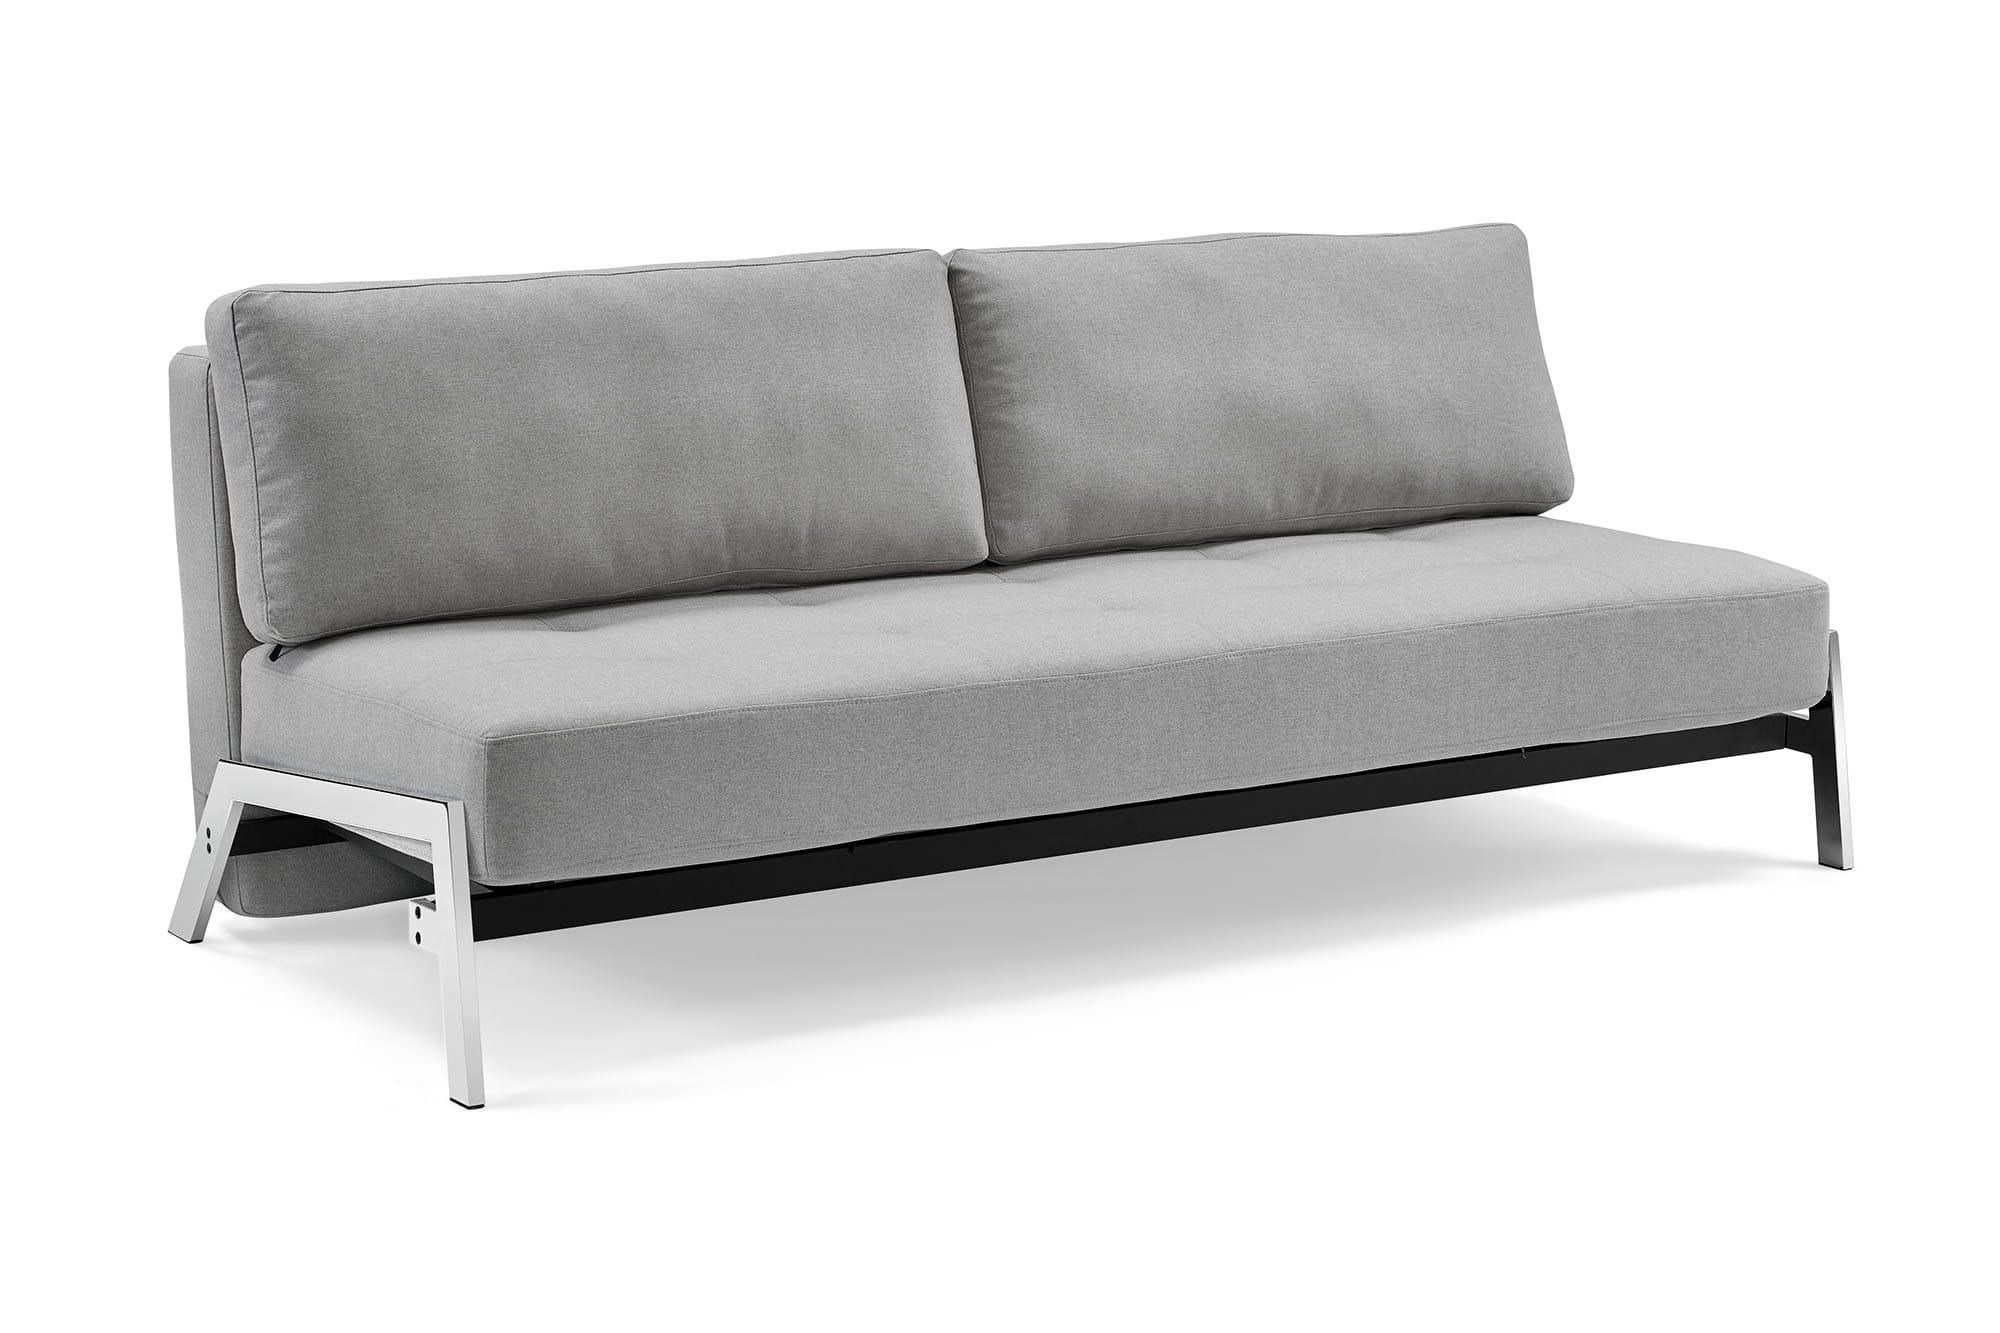 Borolo Madrid Gray Dropback Sofa Convertible By Sealy